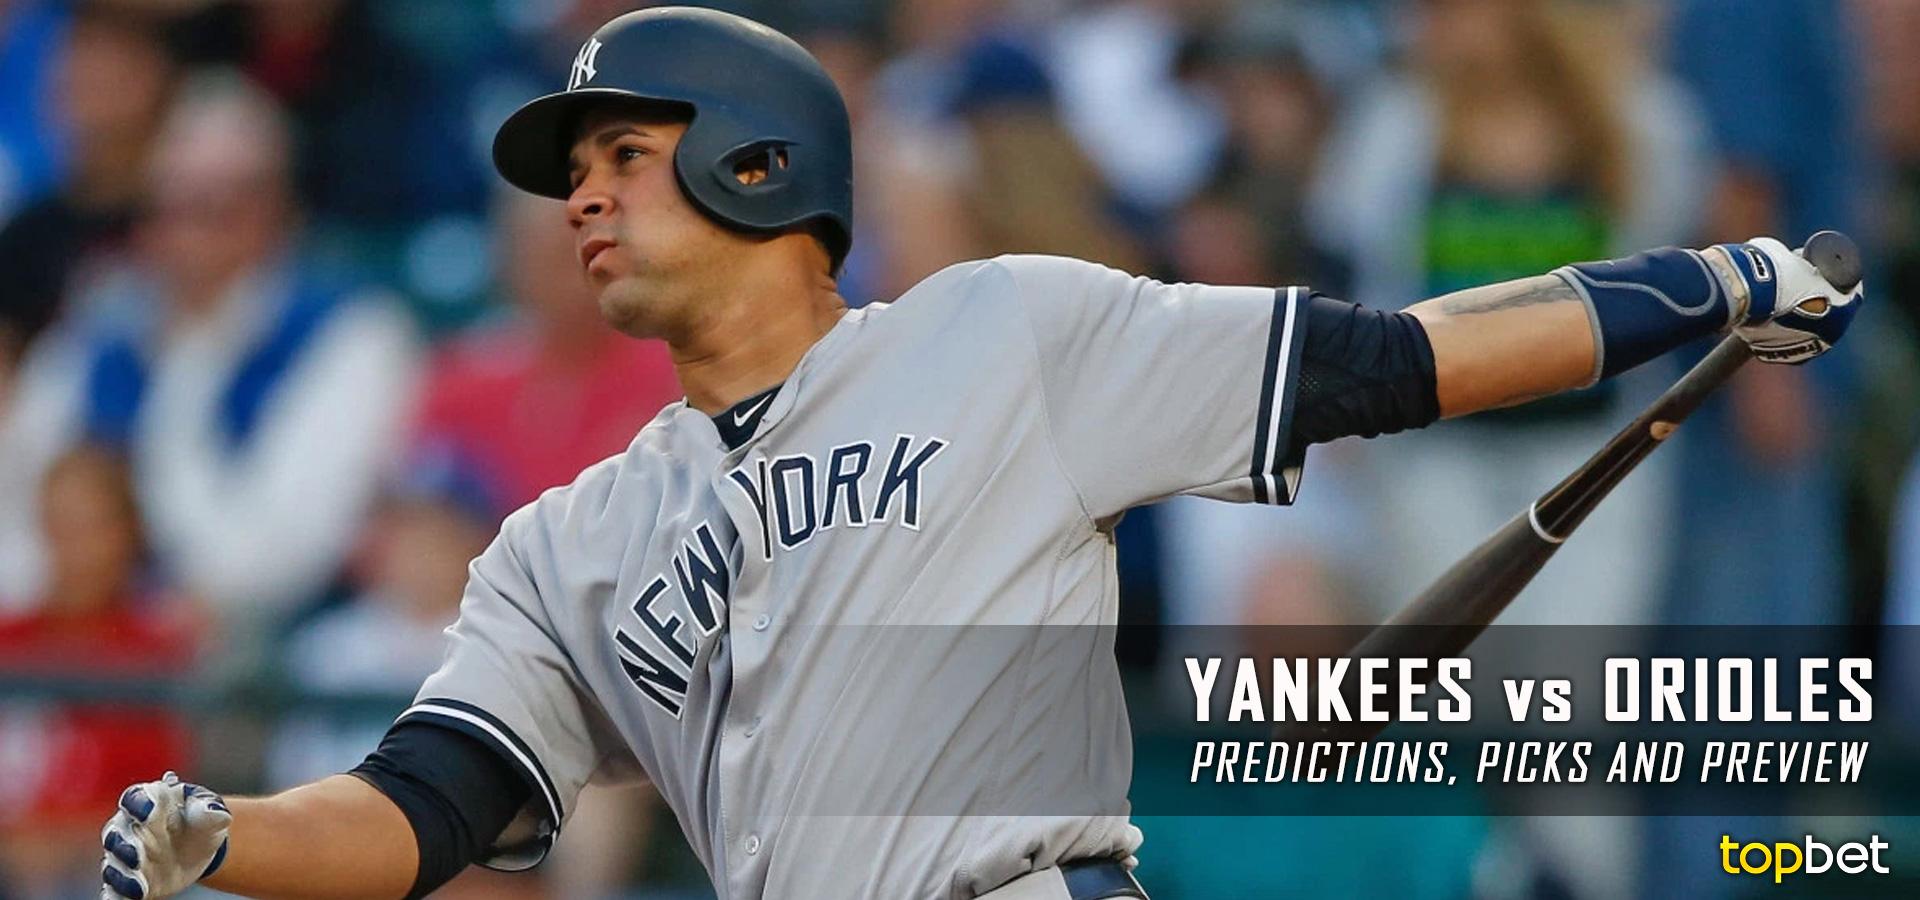 Yankees Vs Orioles Predictions And Picks September 2 2016